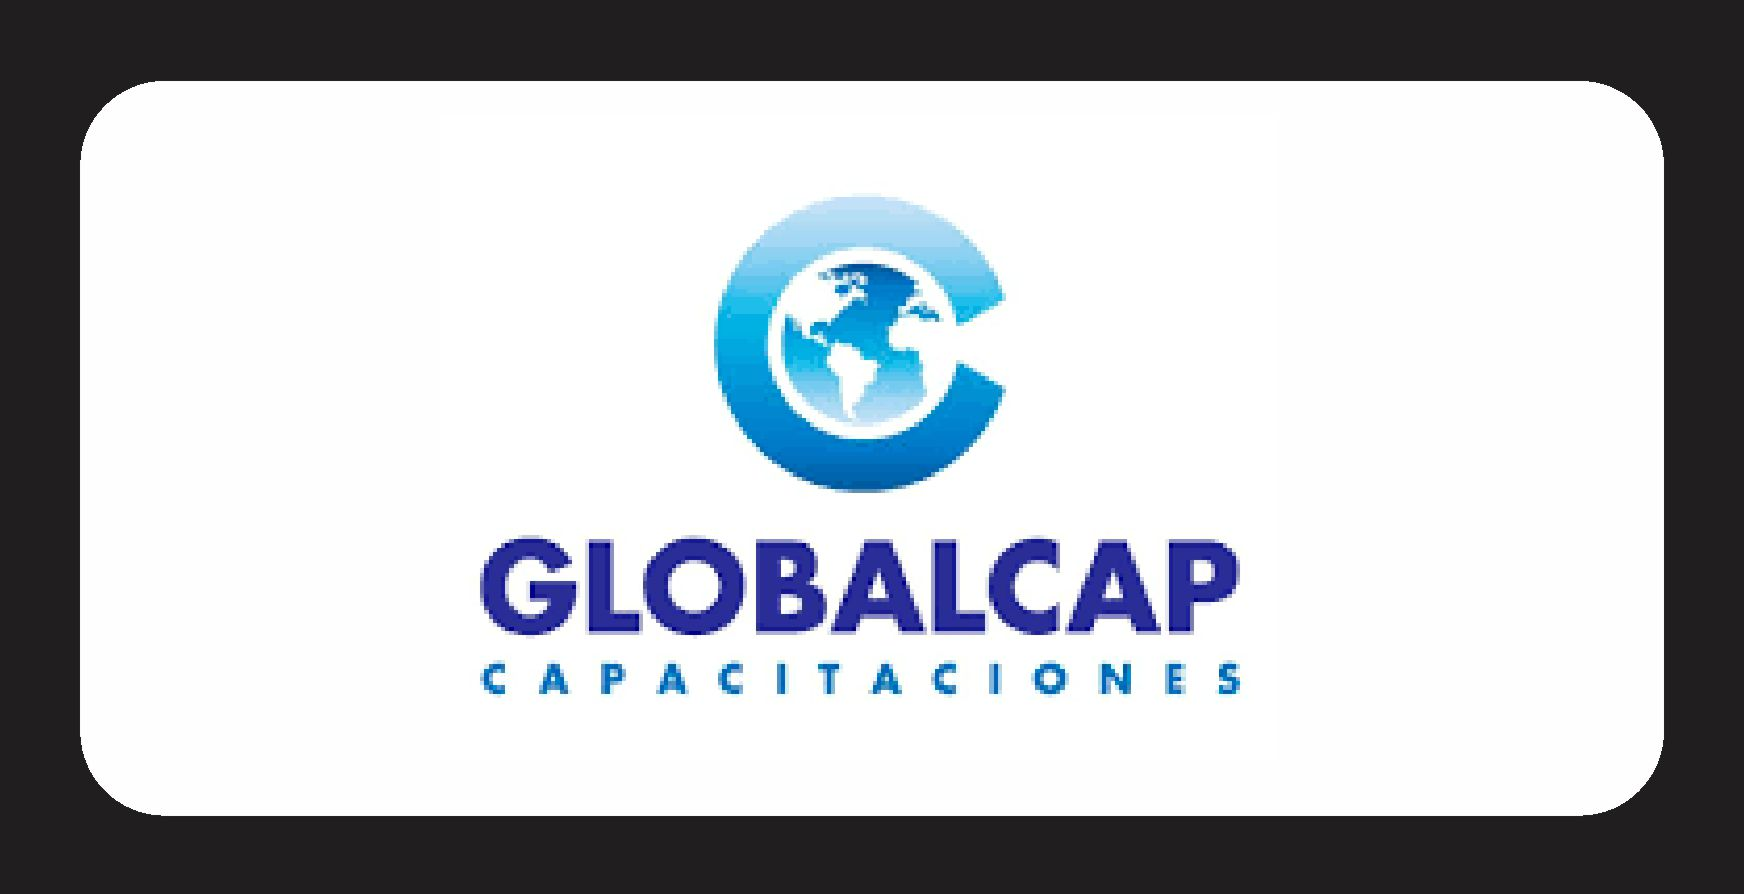 Globalcap